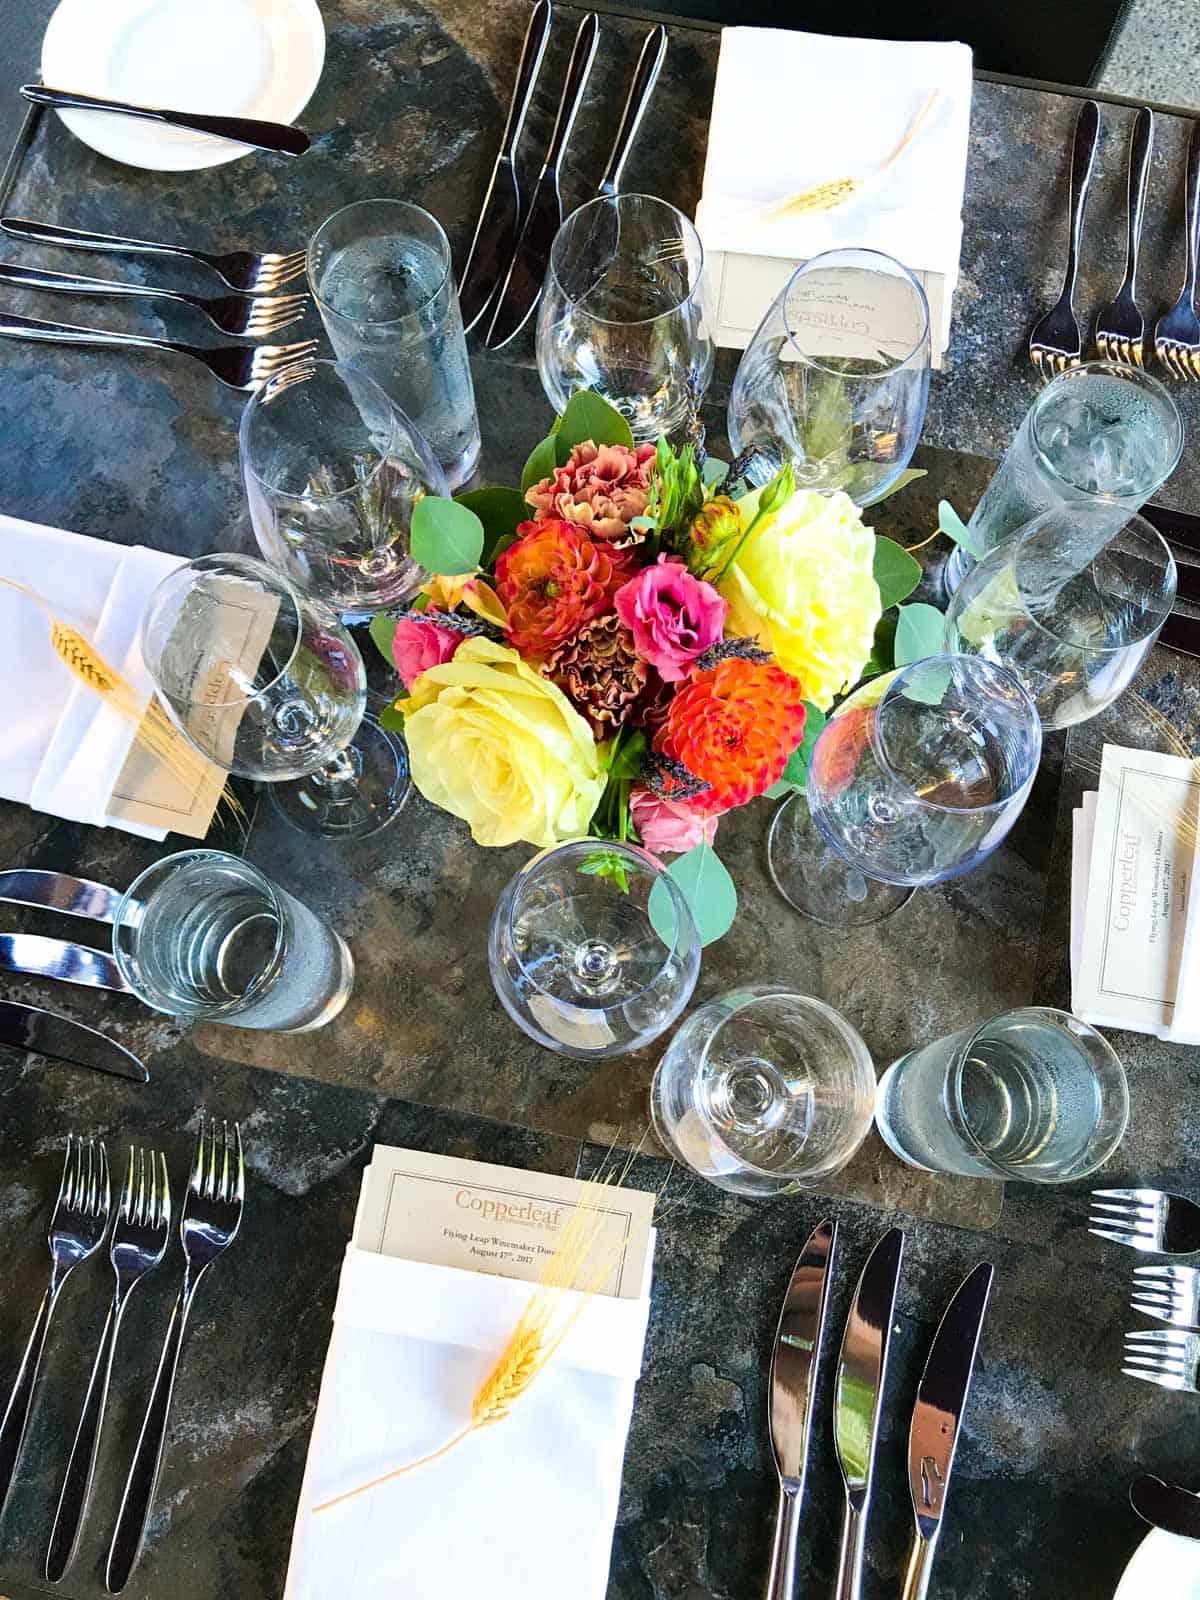 Copperleaf restaurant summertime dining series